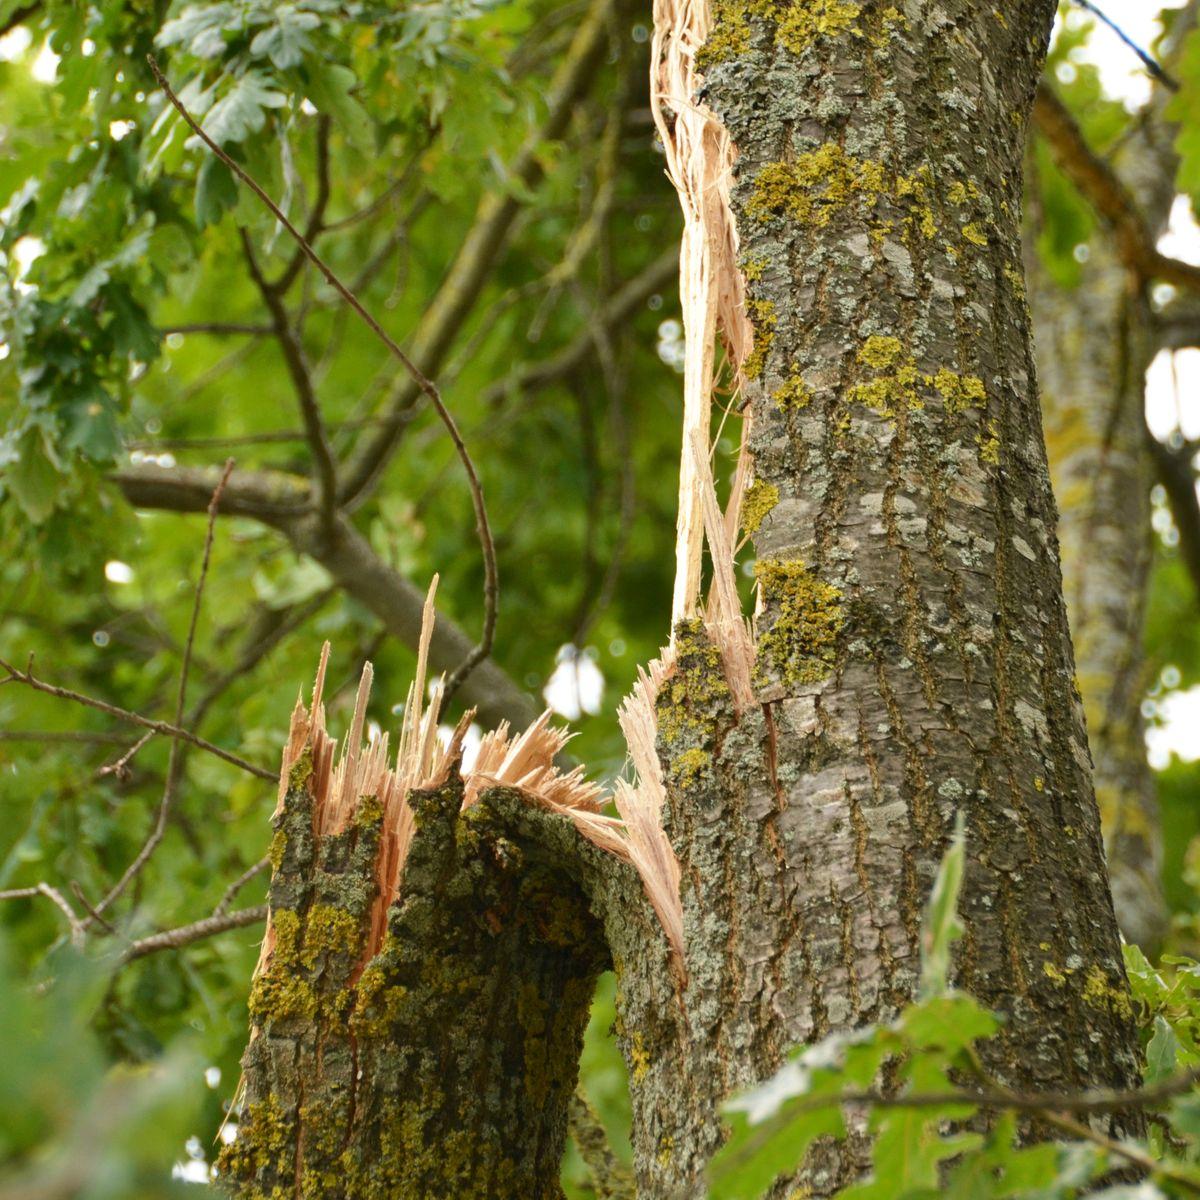 Sturmschaden an Bäumen in Gärten beseitigen